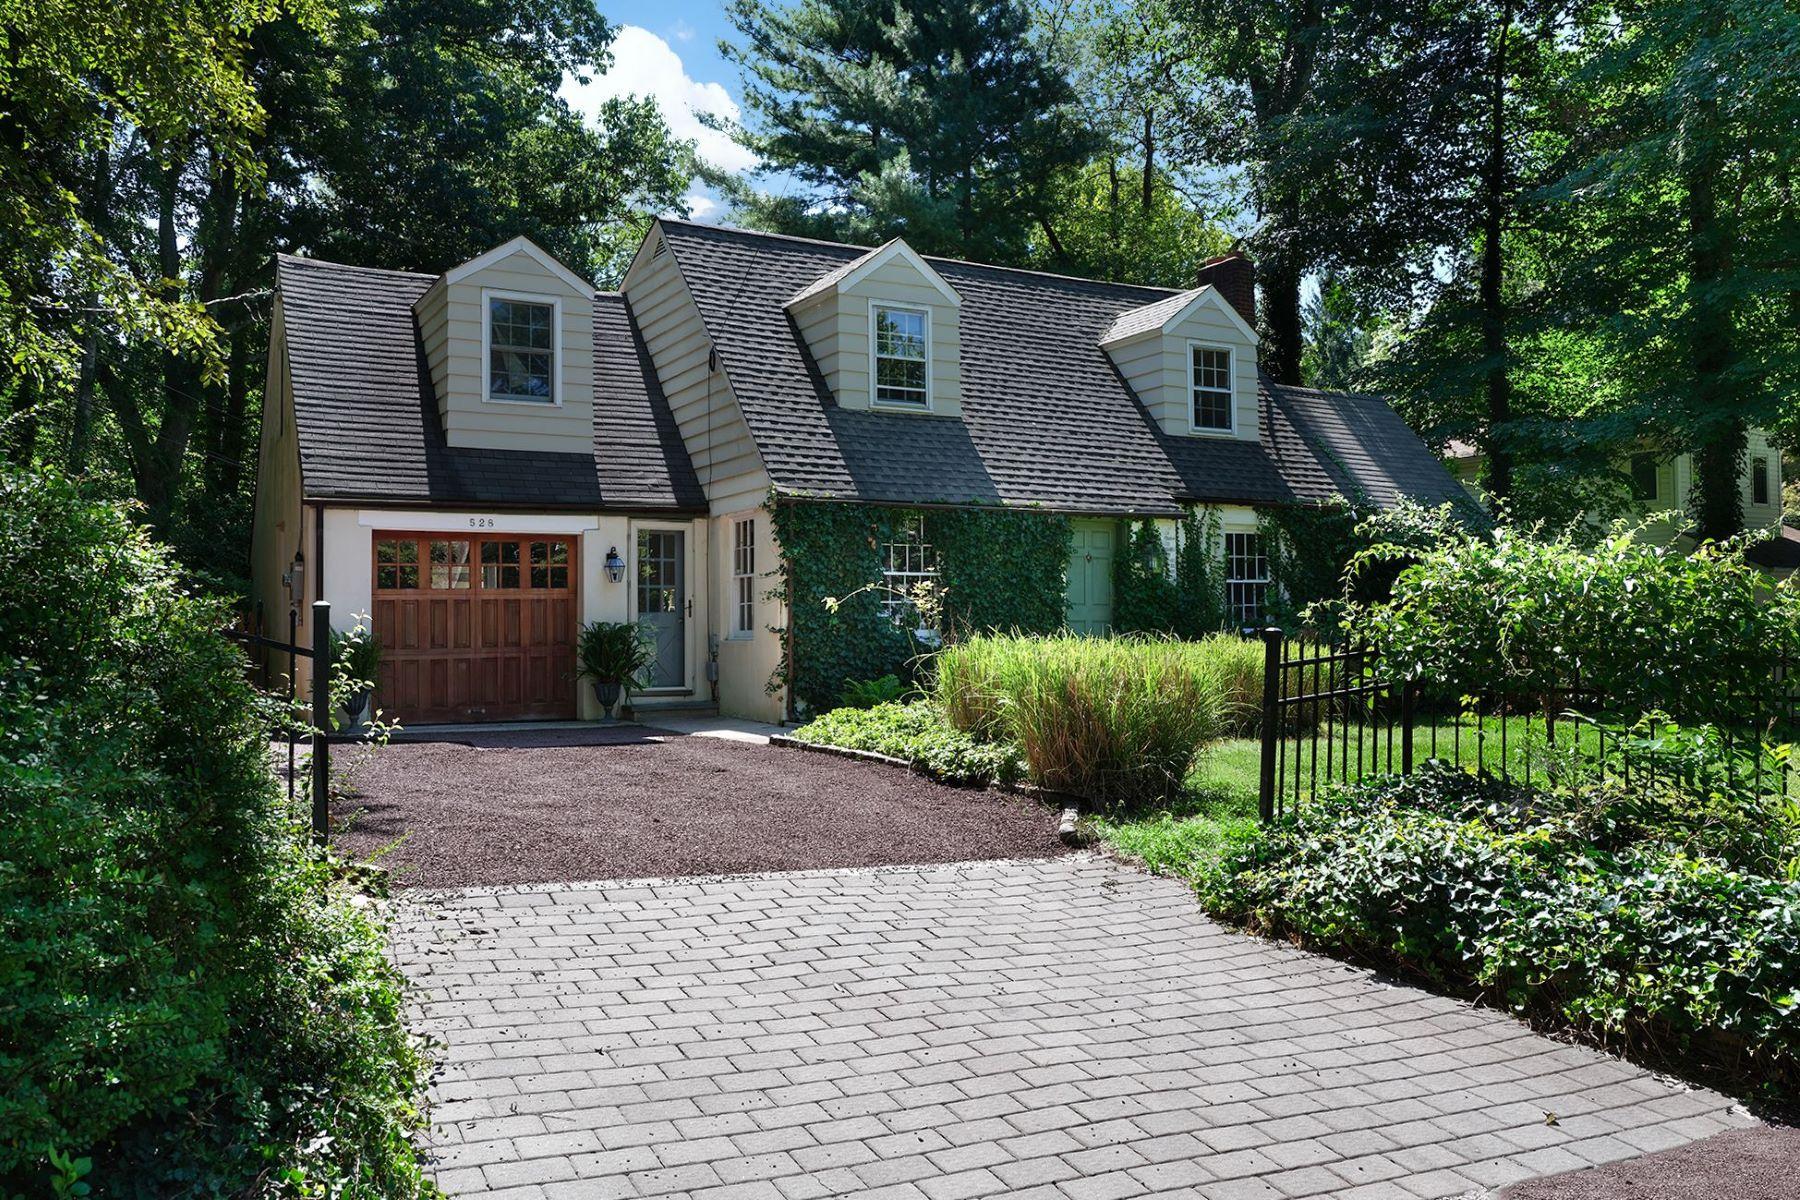 Single Family Homes のために 売買 アット Cottage Style Backing to Battlefield Park 528 Mercer Road, Princeton, ニュージャージー 08540 アメリカ